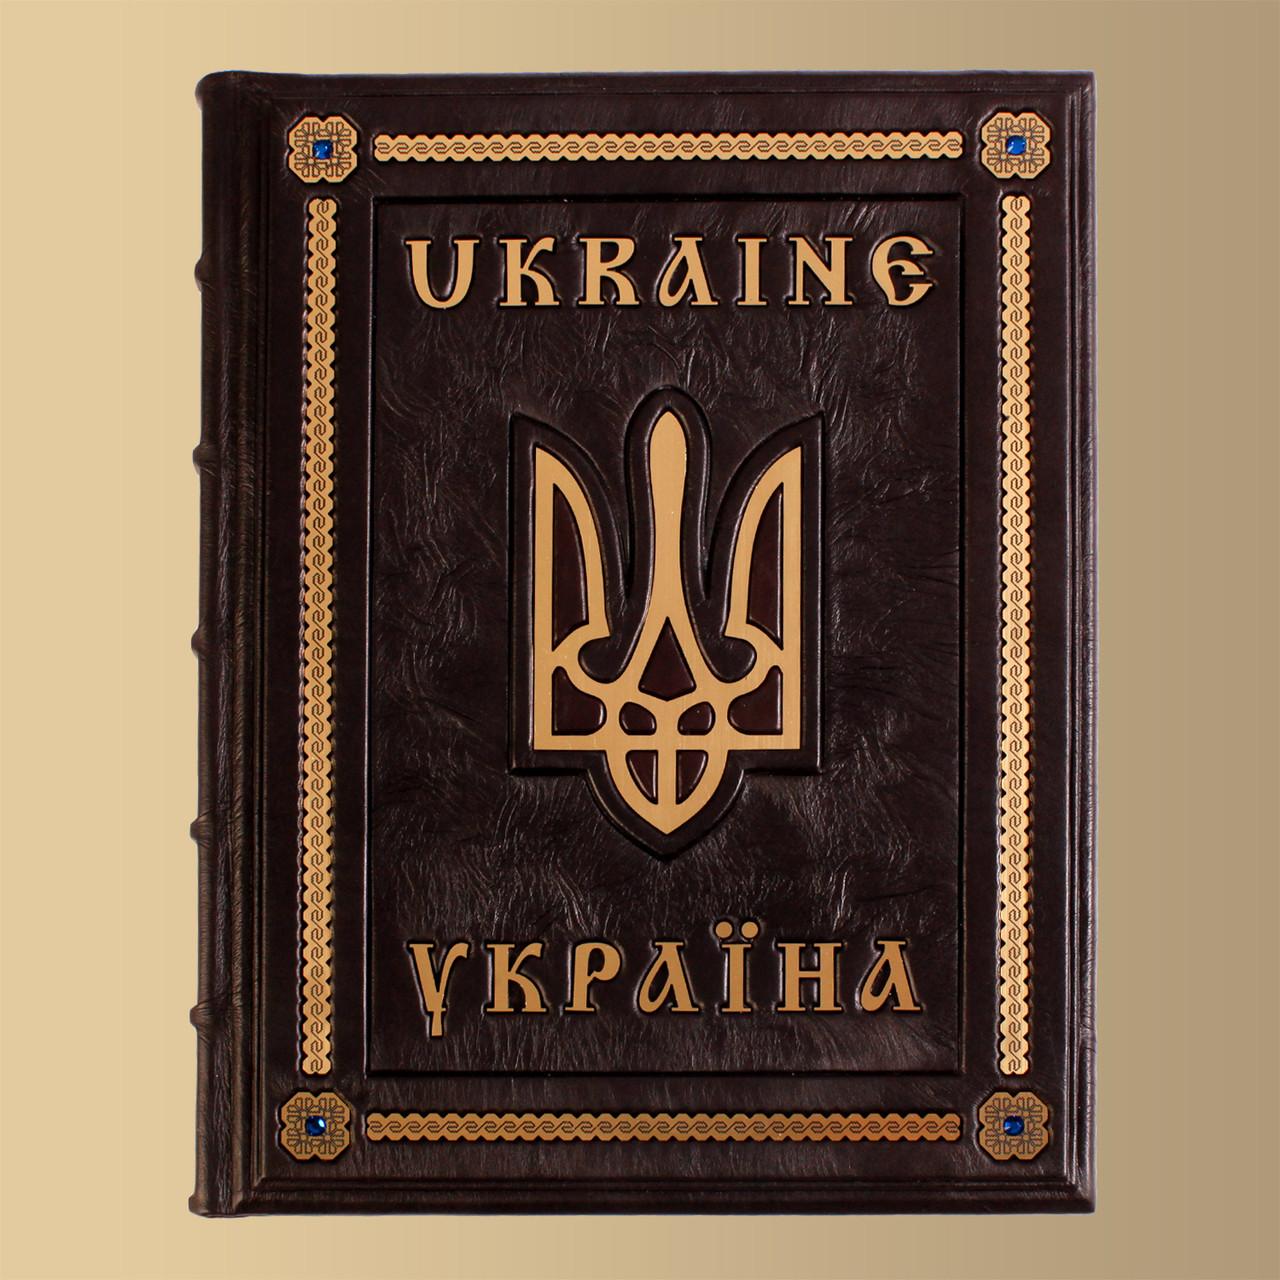 "Книга ""Україна. Ukraine"" Фотоальбом країни Ексклюзивна серія книг"